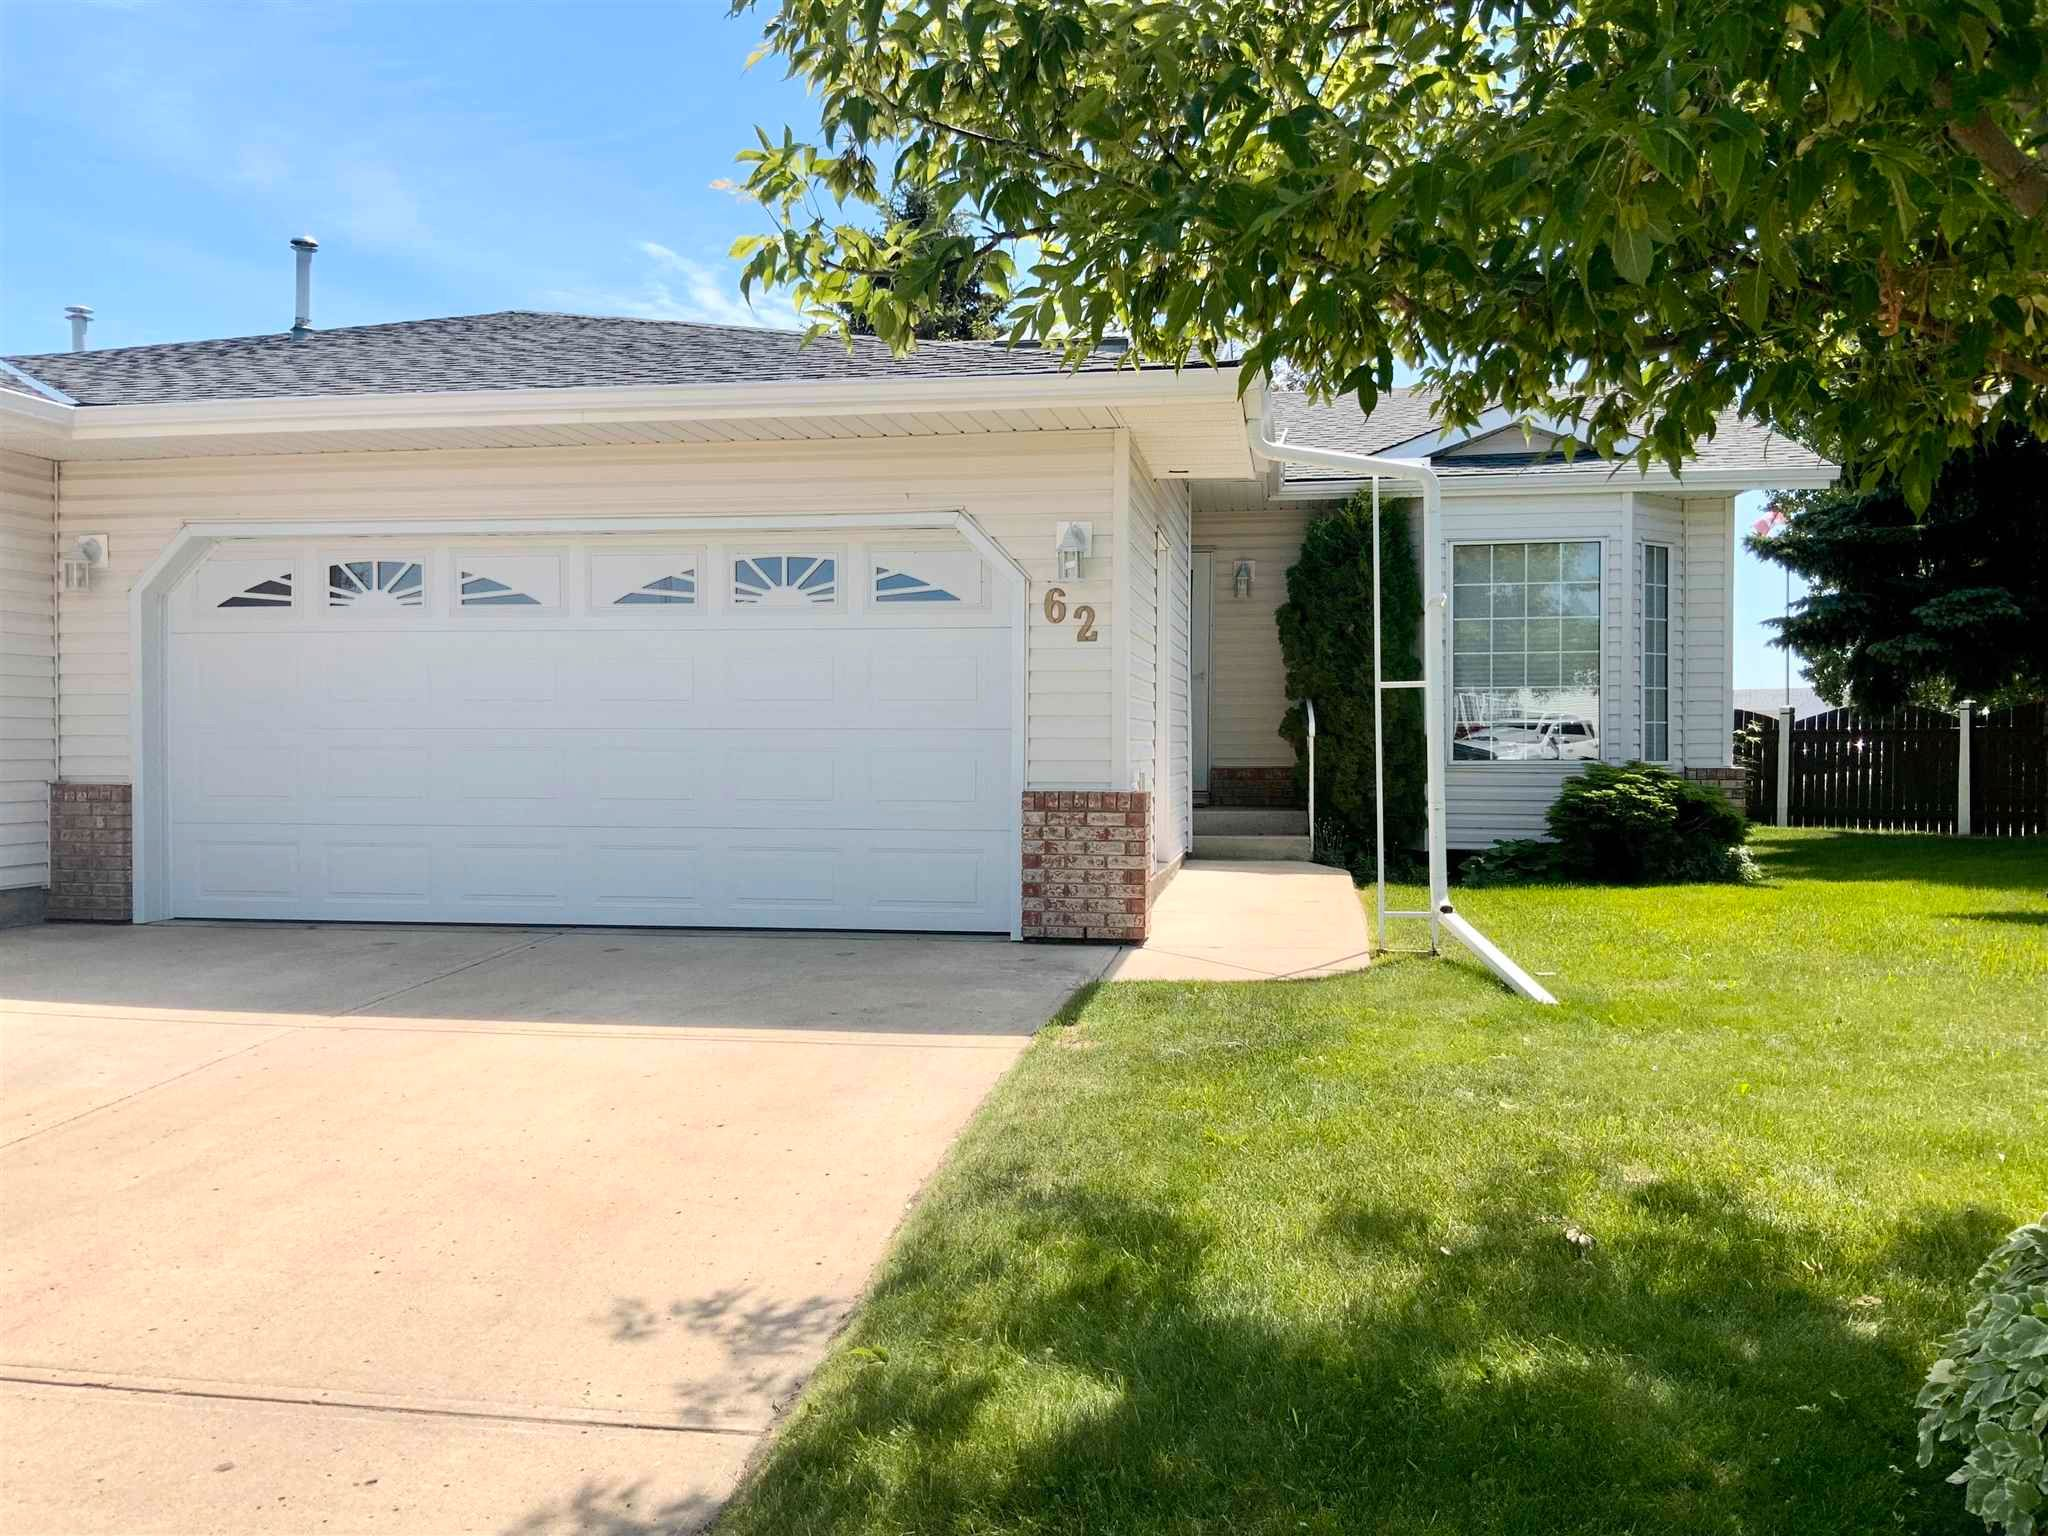 Main Photo: 62 4410 52 Avenue: Wetaskiwin House Half Duplex for sale : MLS®# E4250972